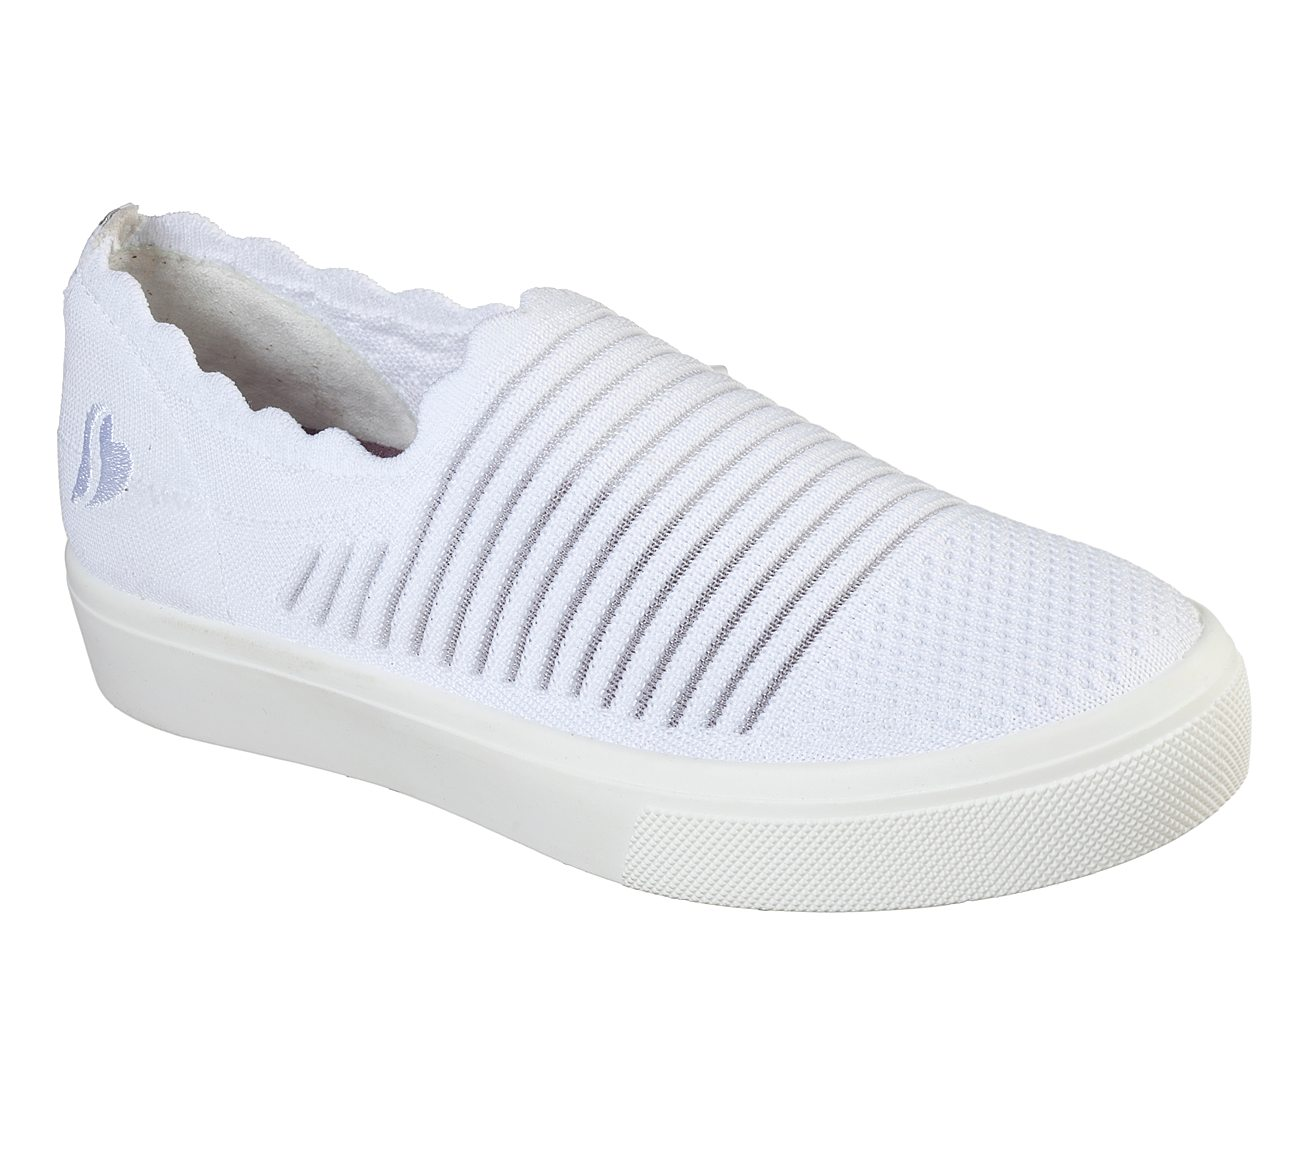 skechers white dress shoes